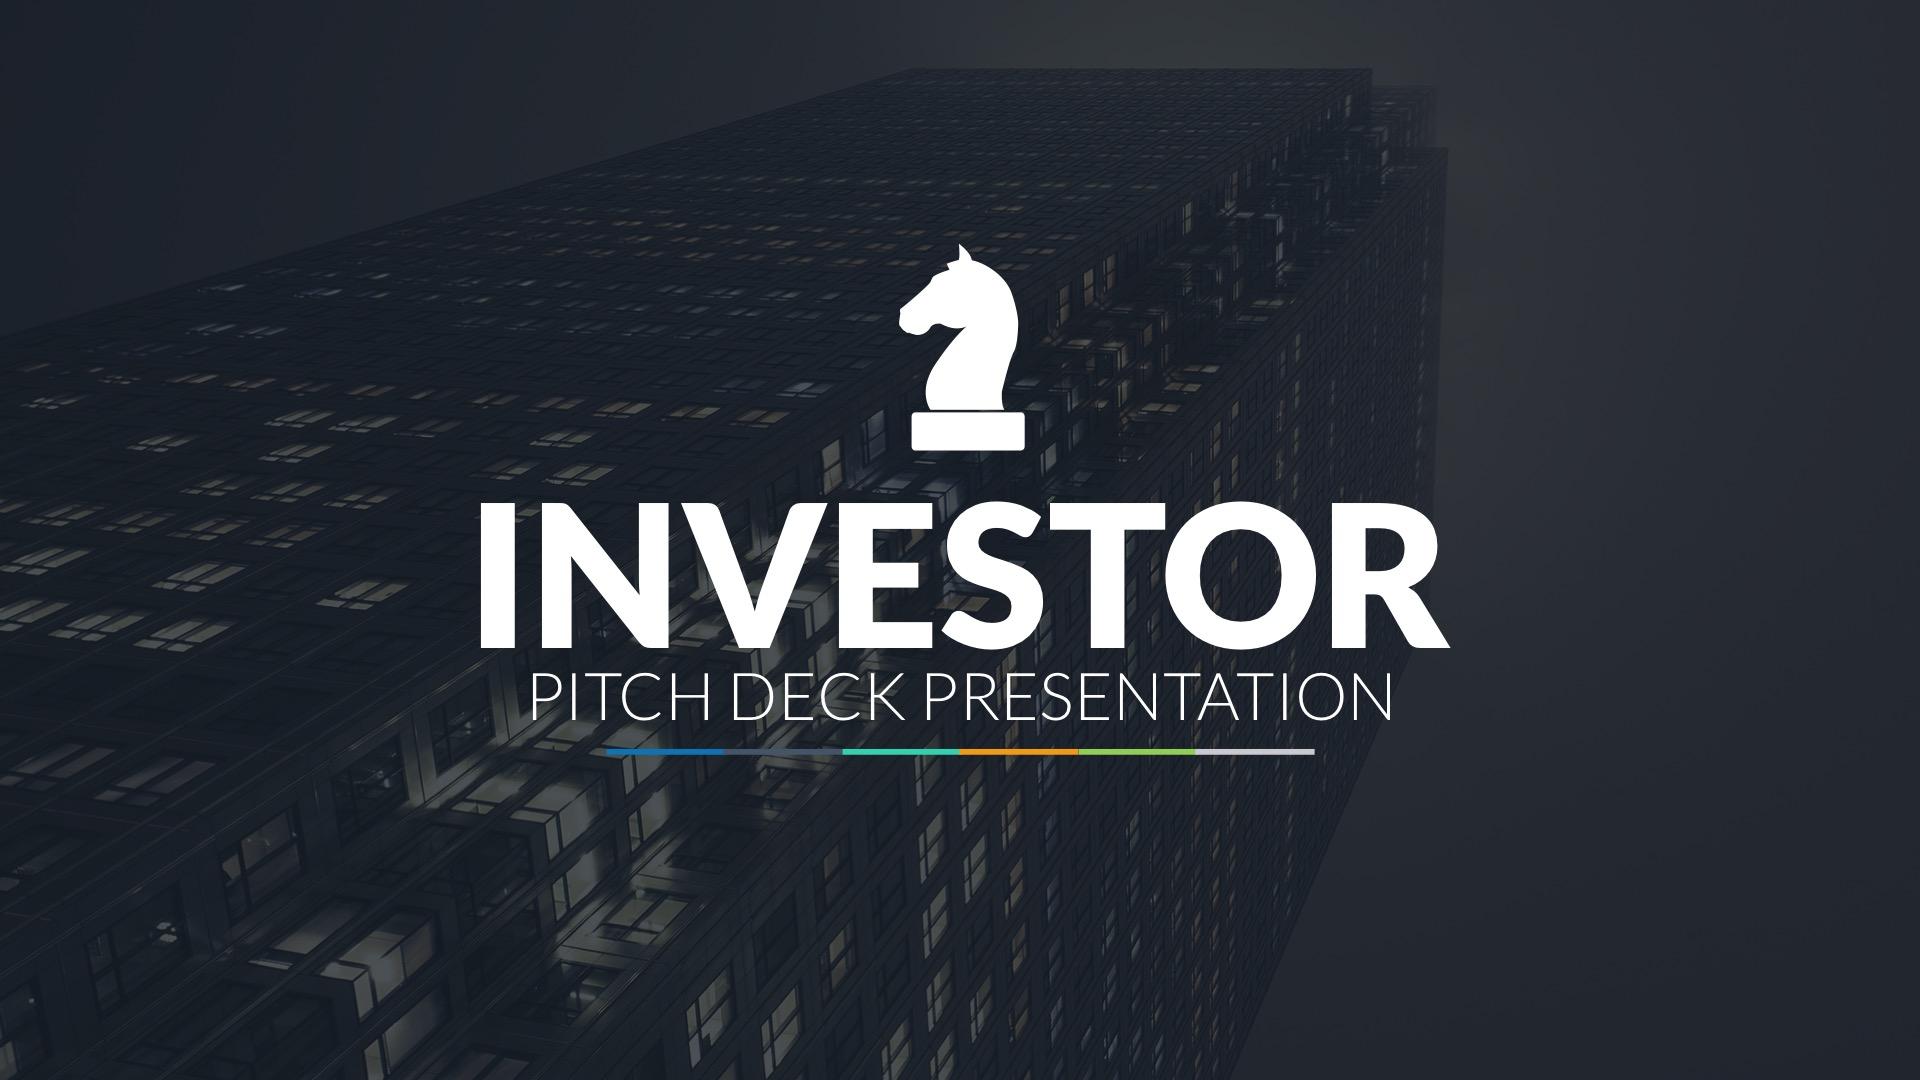 Investor Pitch Deck Google Slides Template